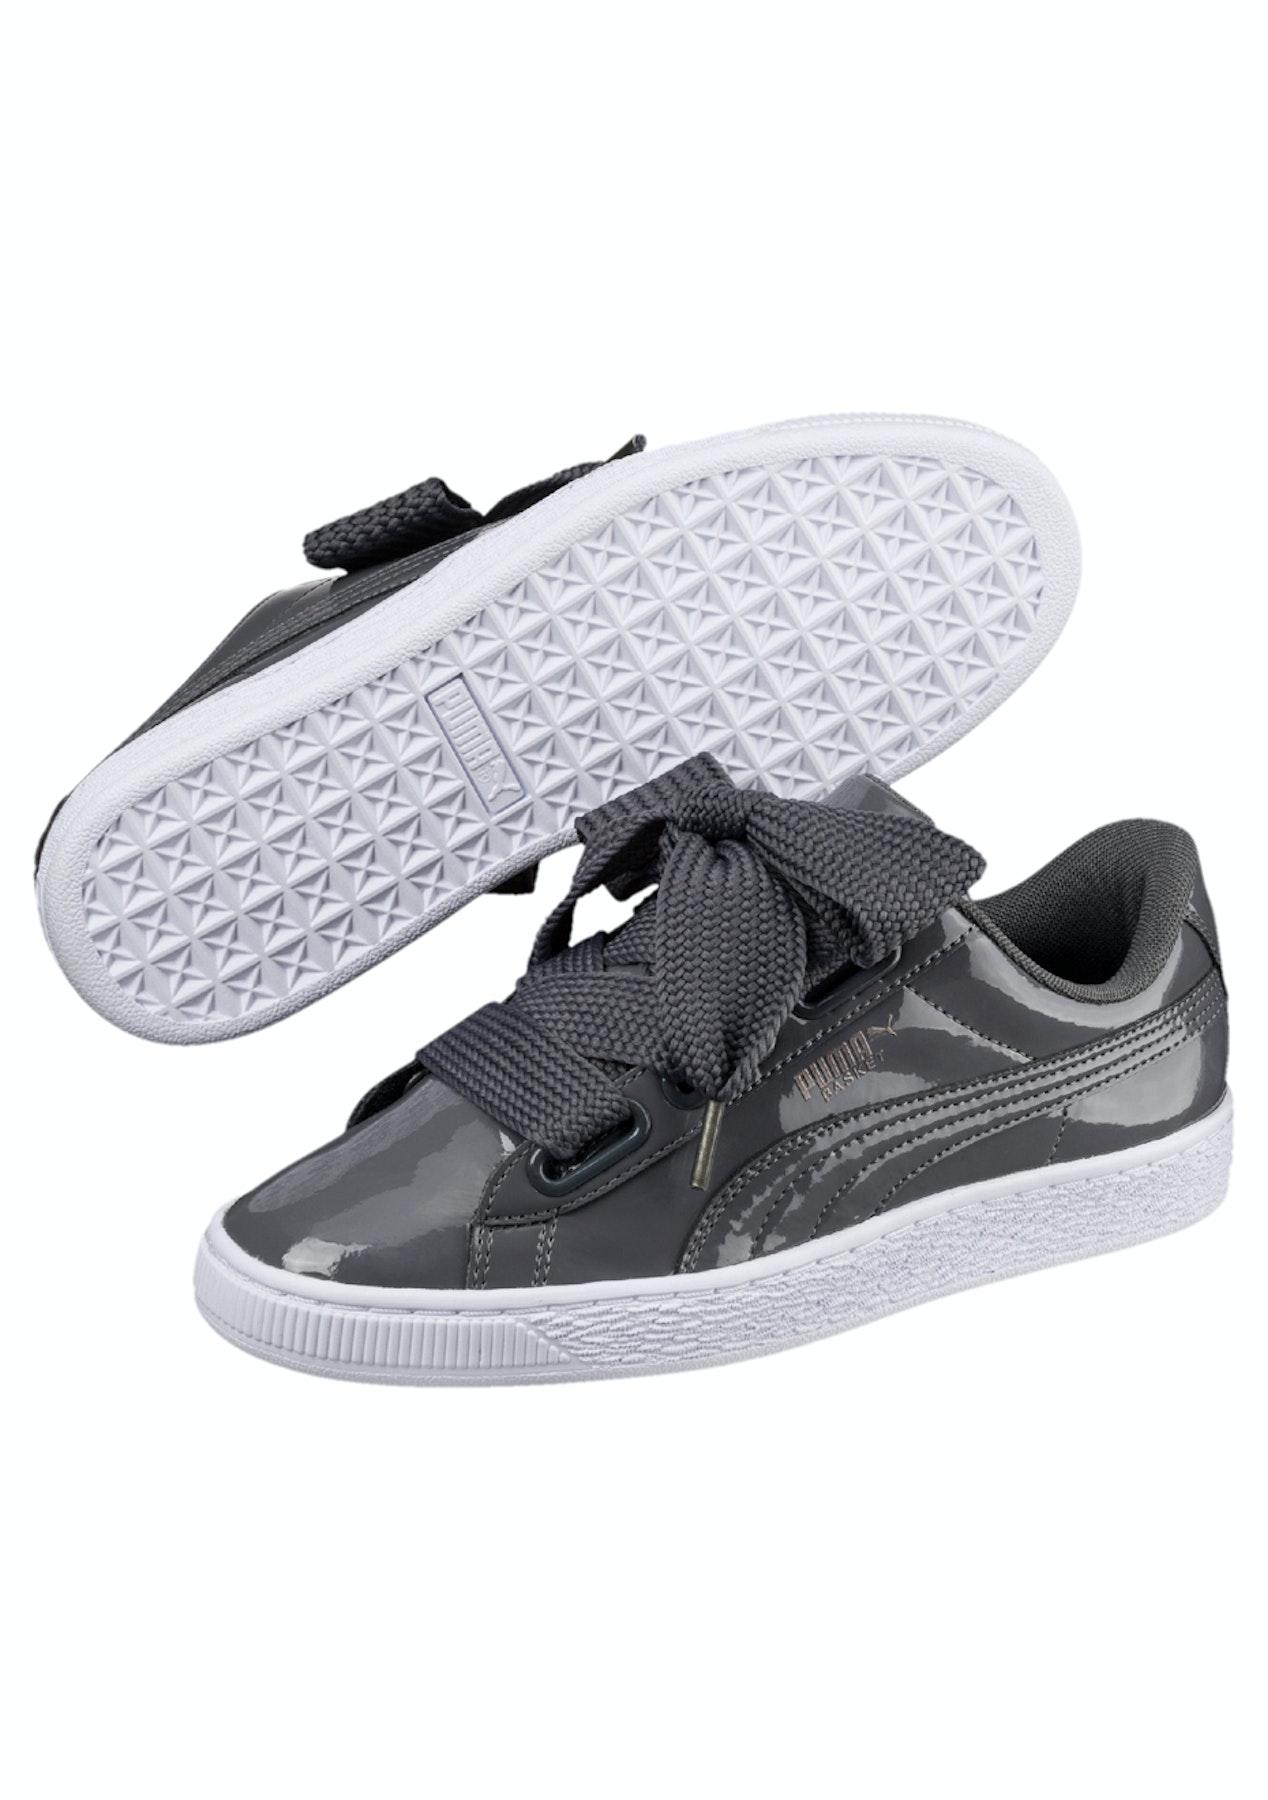 d0bb7da0c5fe Puma Womens - Basket Heart Patent - Iron - All Shoes  60 - Onceit